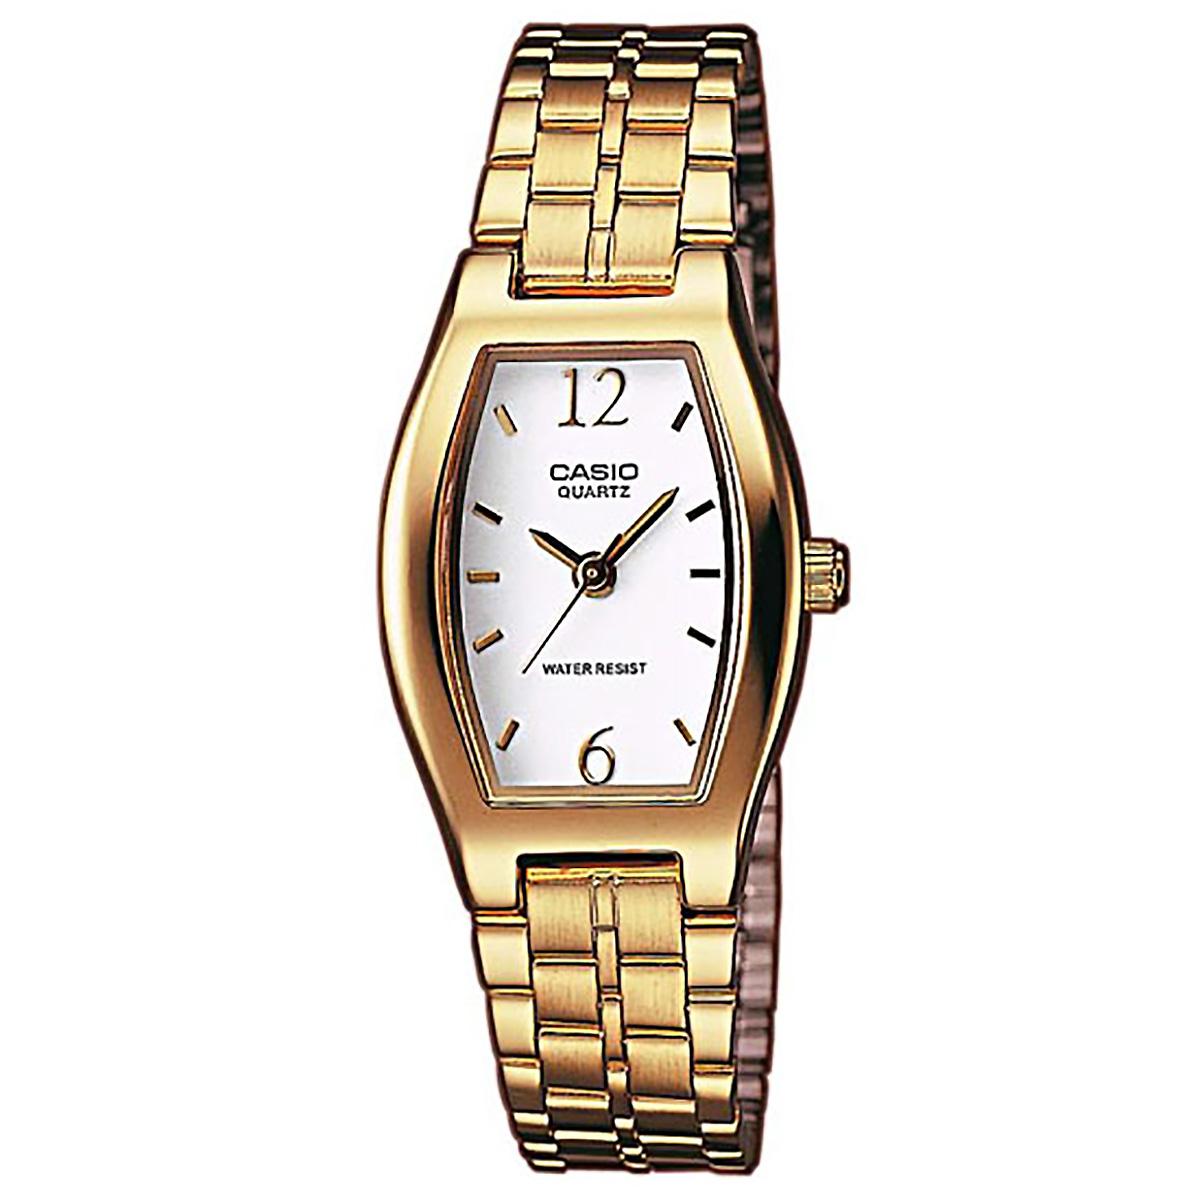 casio damenuhr ltp 1281pg 7aef armbanduhr edelstahl wei gold watch neu ovp ebay. Black Bedroom Furniture Sets. Home Design Ideas